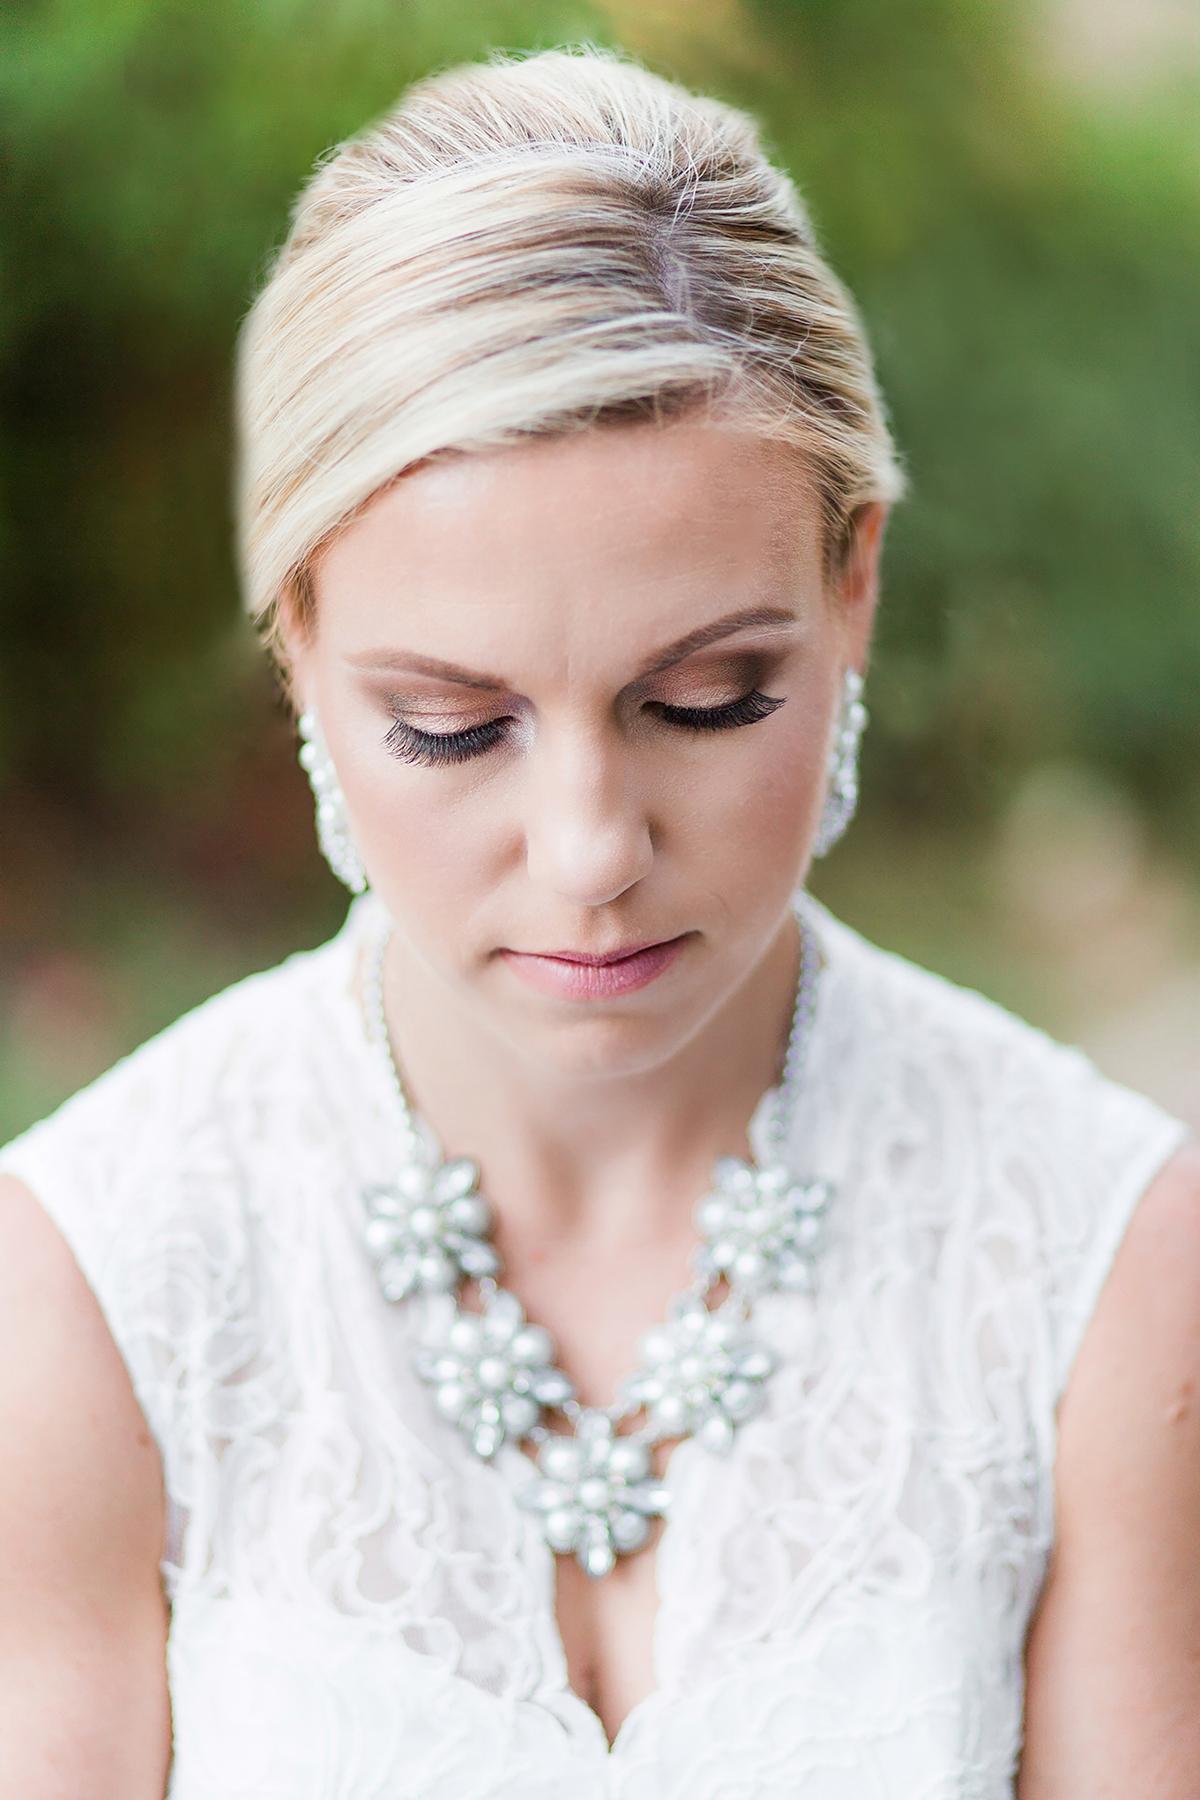 Intimate-Military-Elopement-bride-portrait.jpg